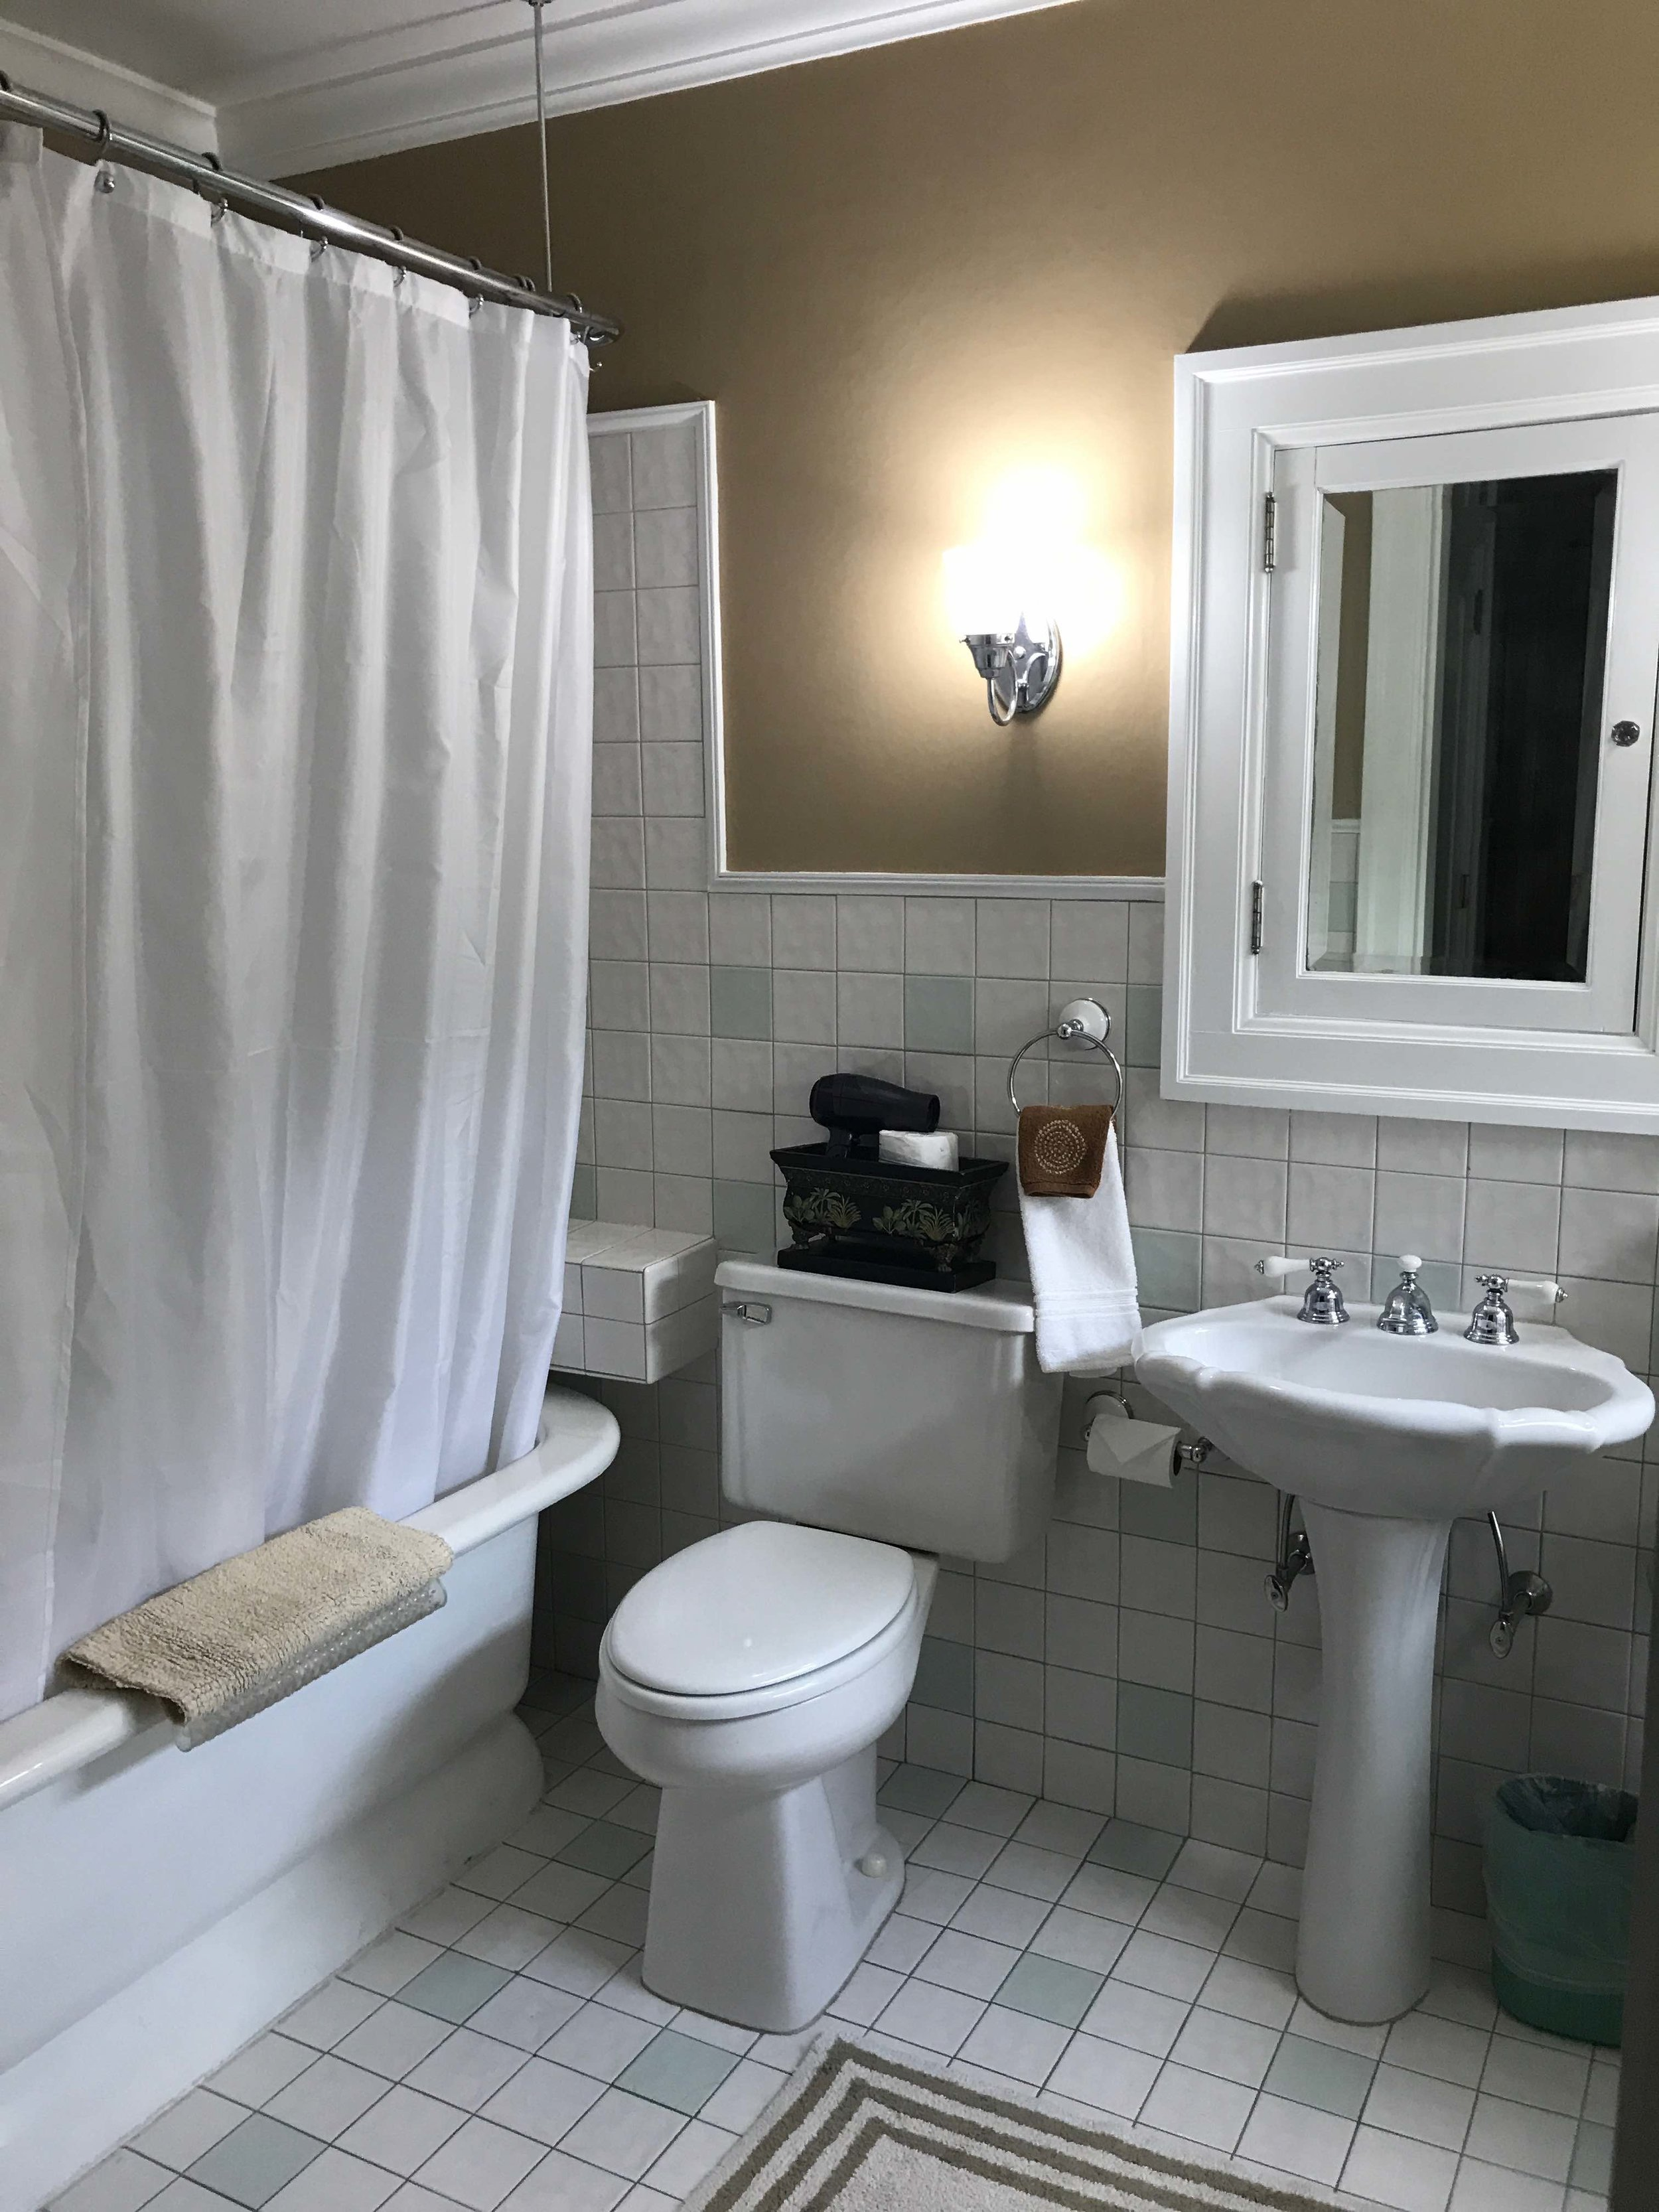 Room 4 bathtub.jpg